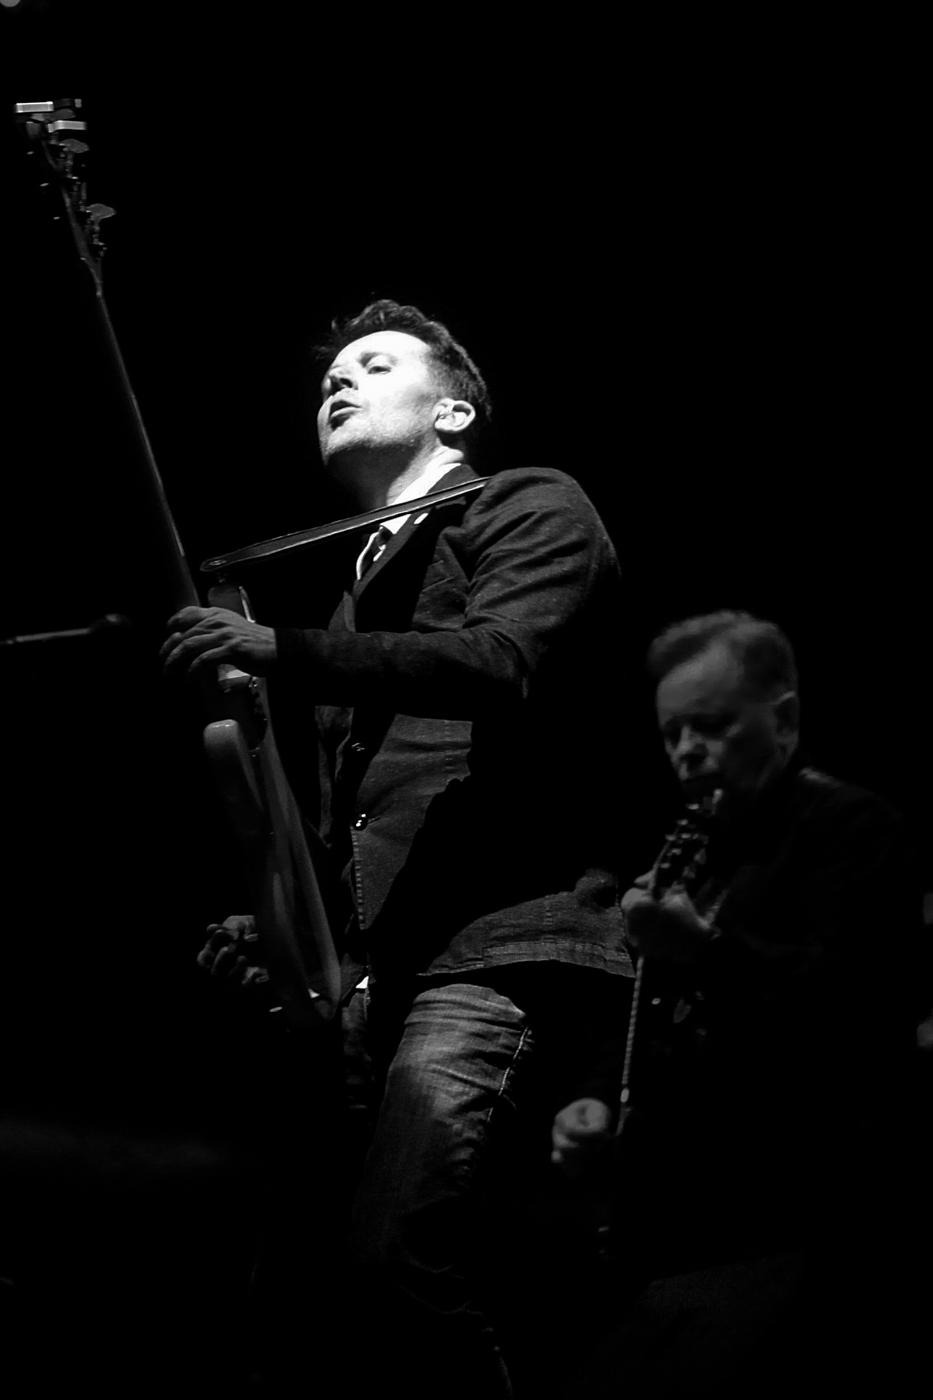 New Order - Music - Julián Rus - Music